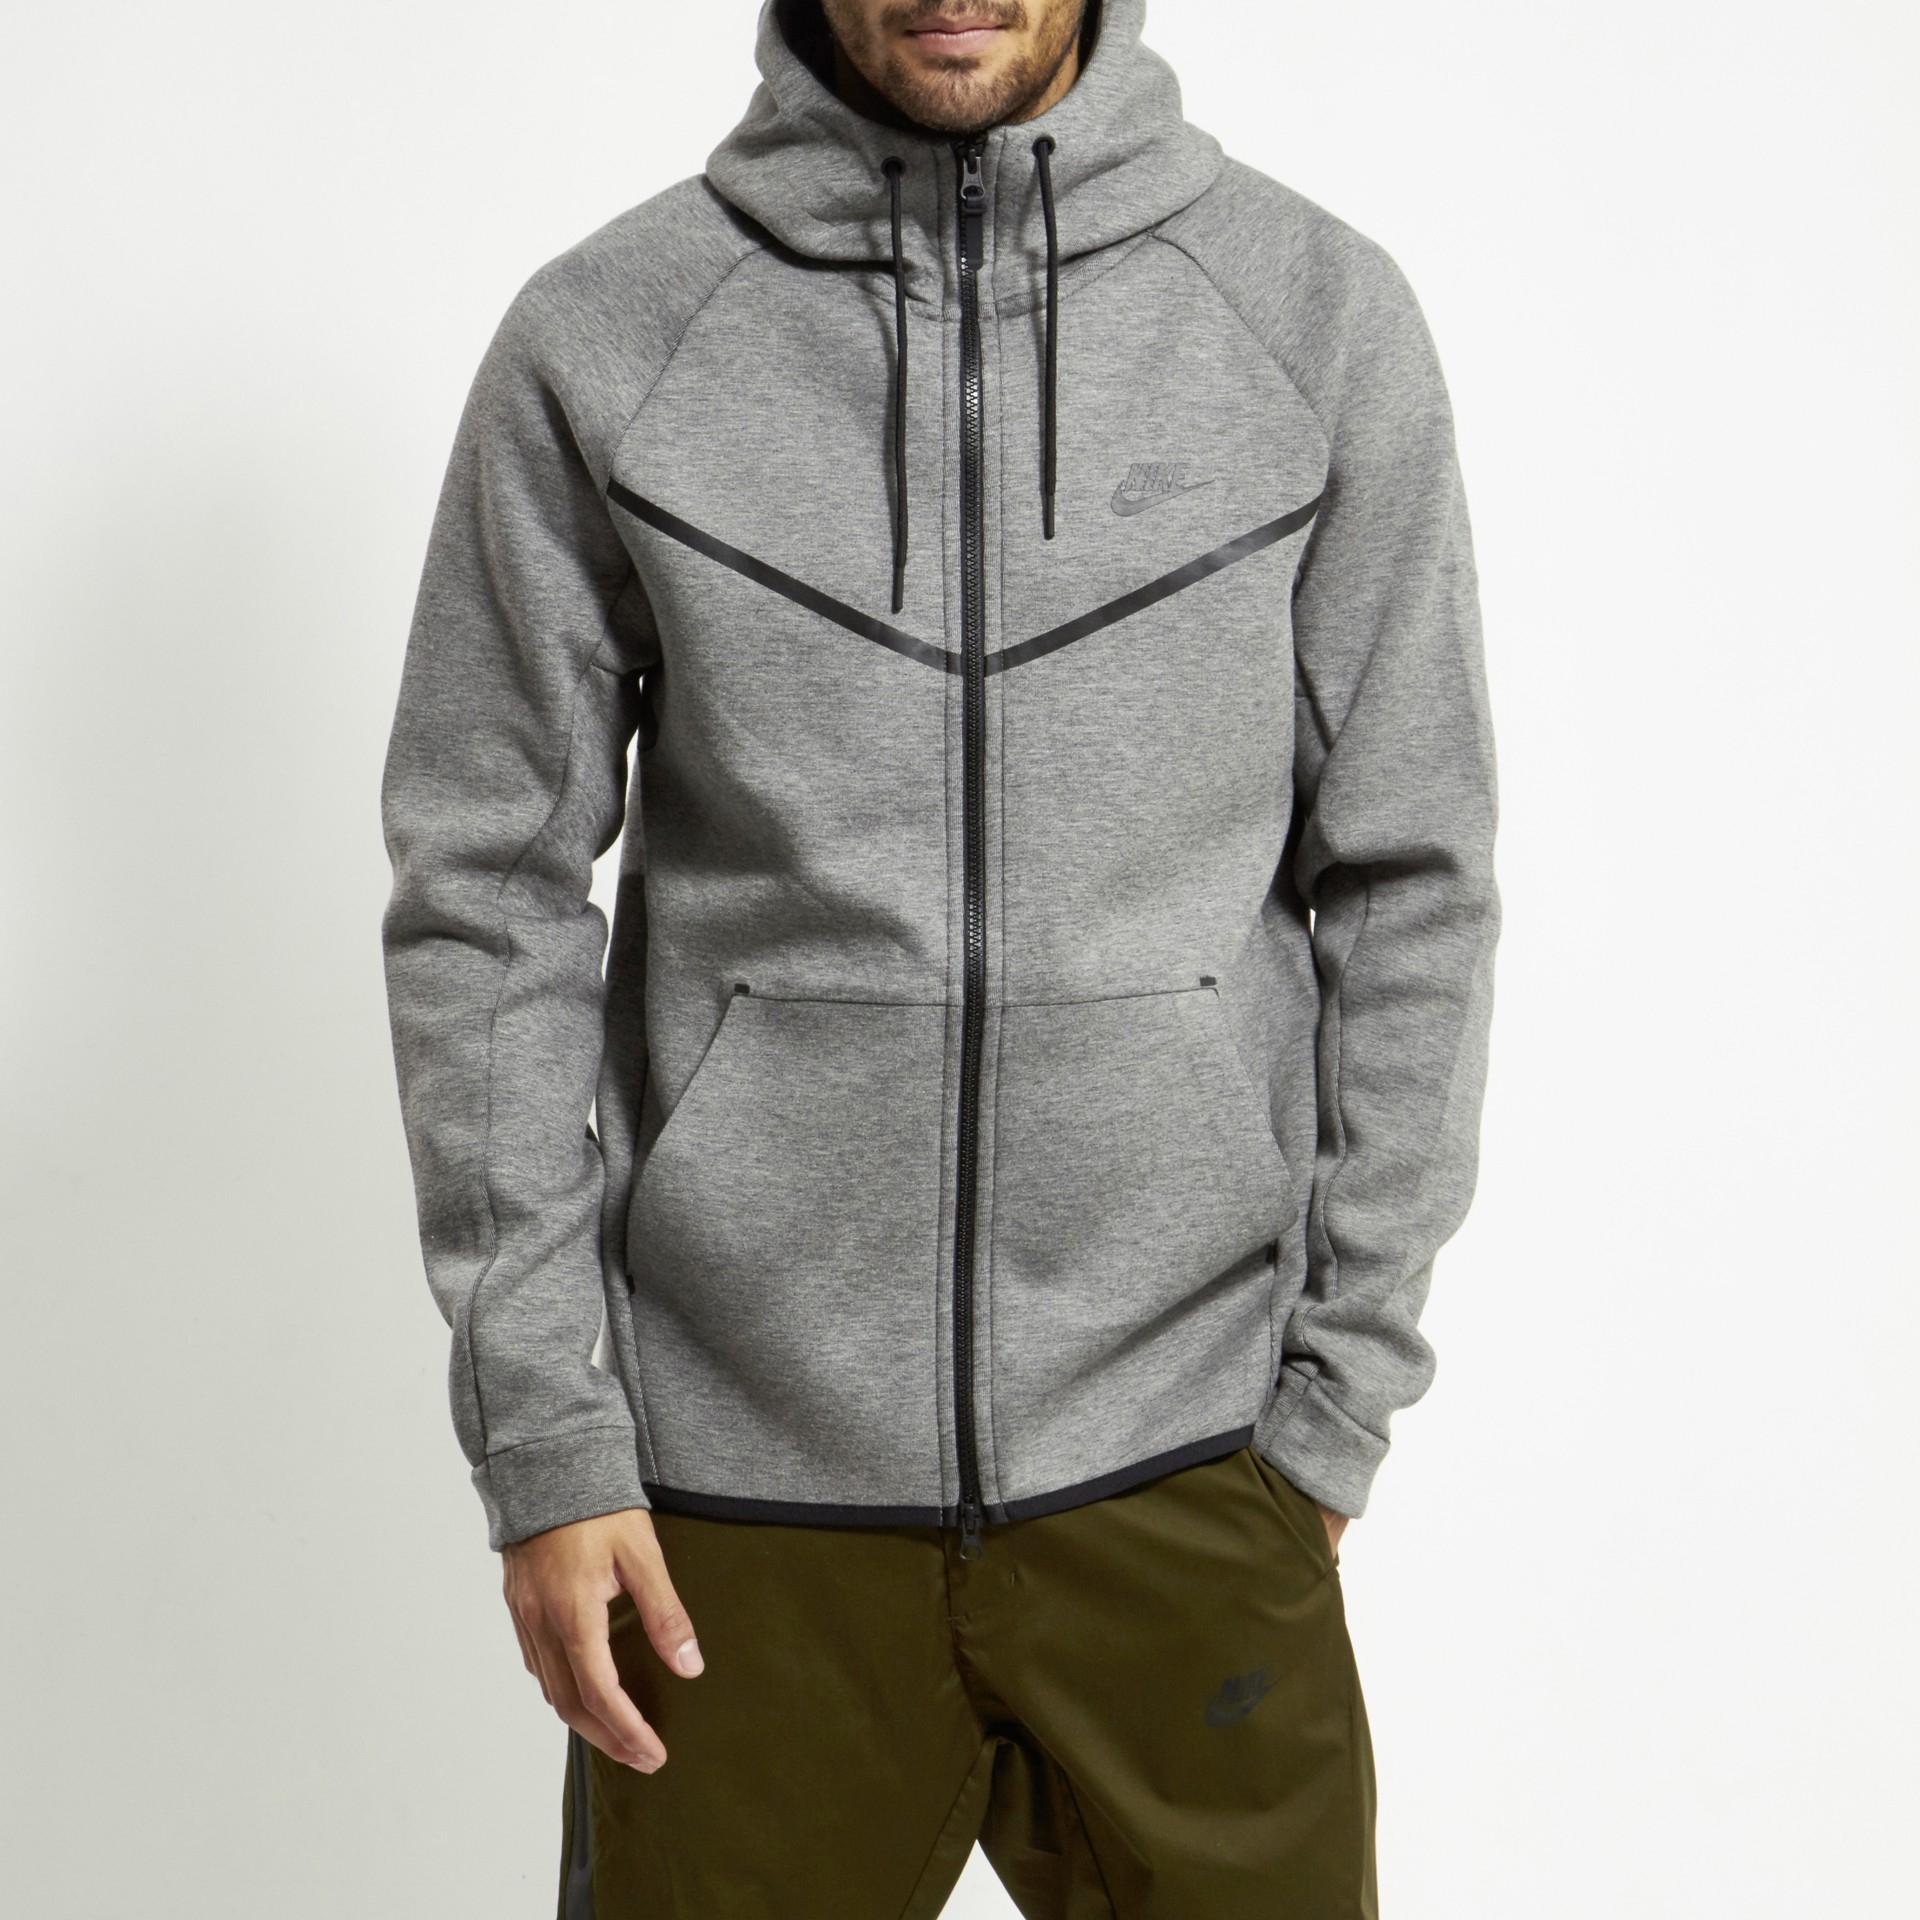 Veste Homme Hoodie Nike Tech Fleece Windrunner